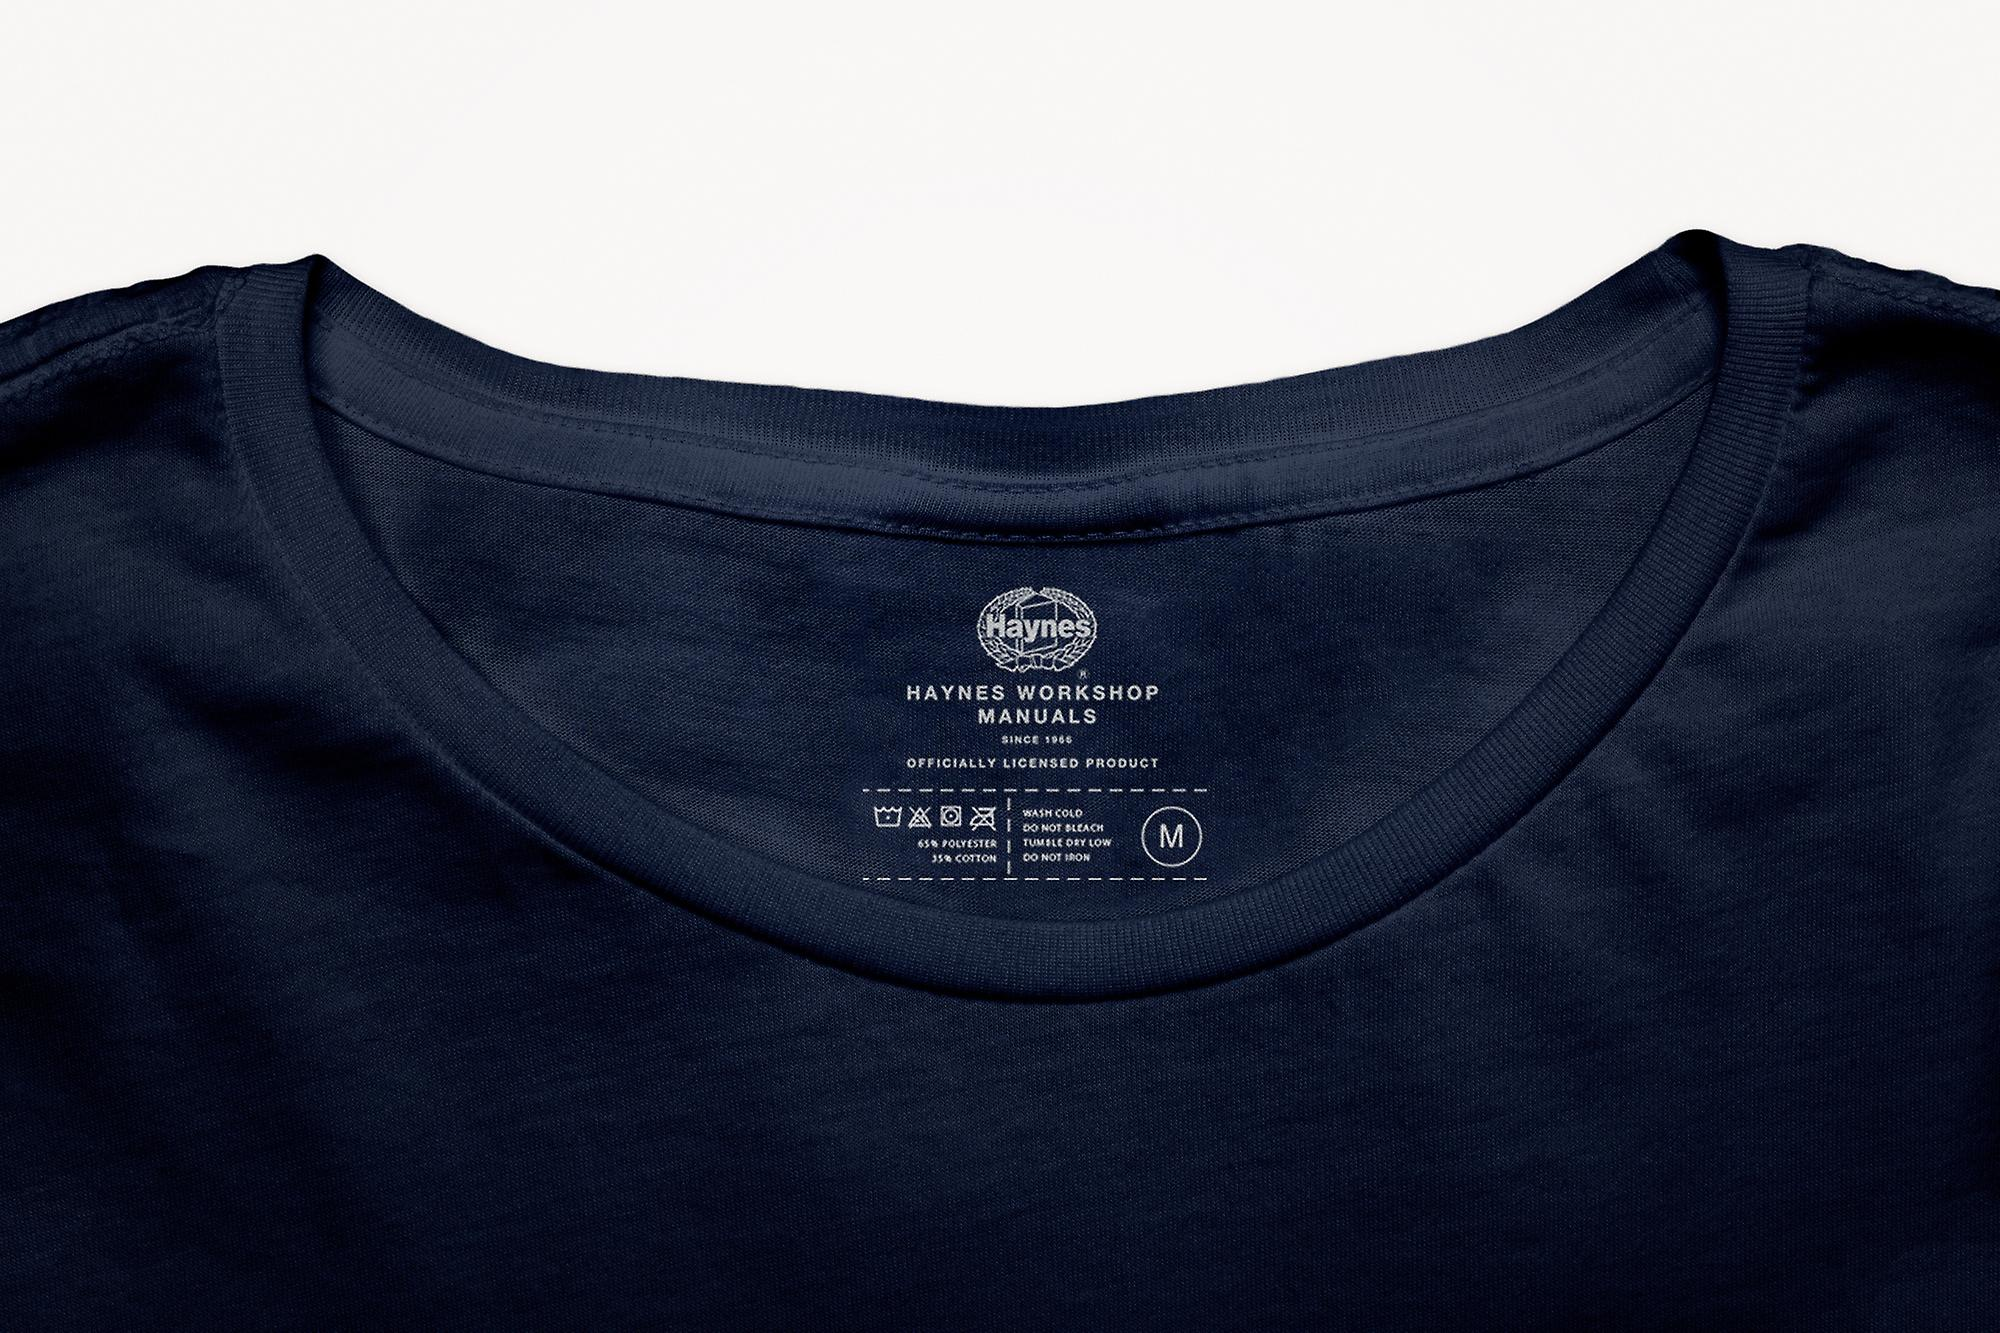 Official Haynes Manual Unisex T-shirt VW Beetle 1.6L '70 thru '74 Owners Workshop Manual